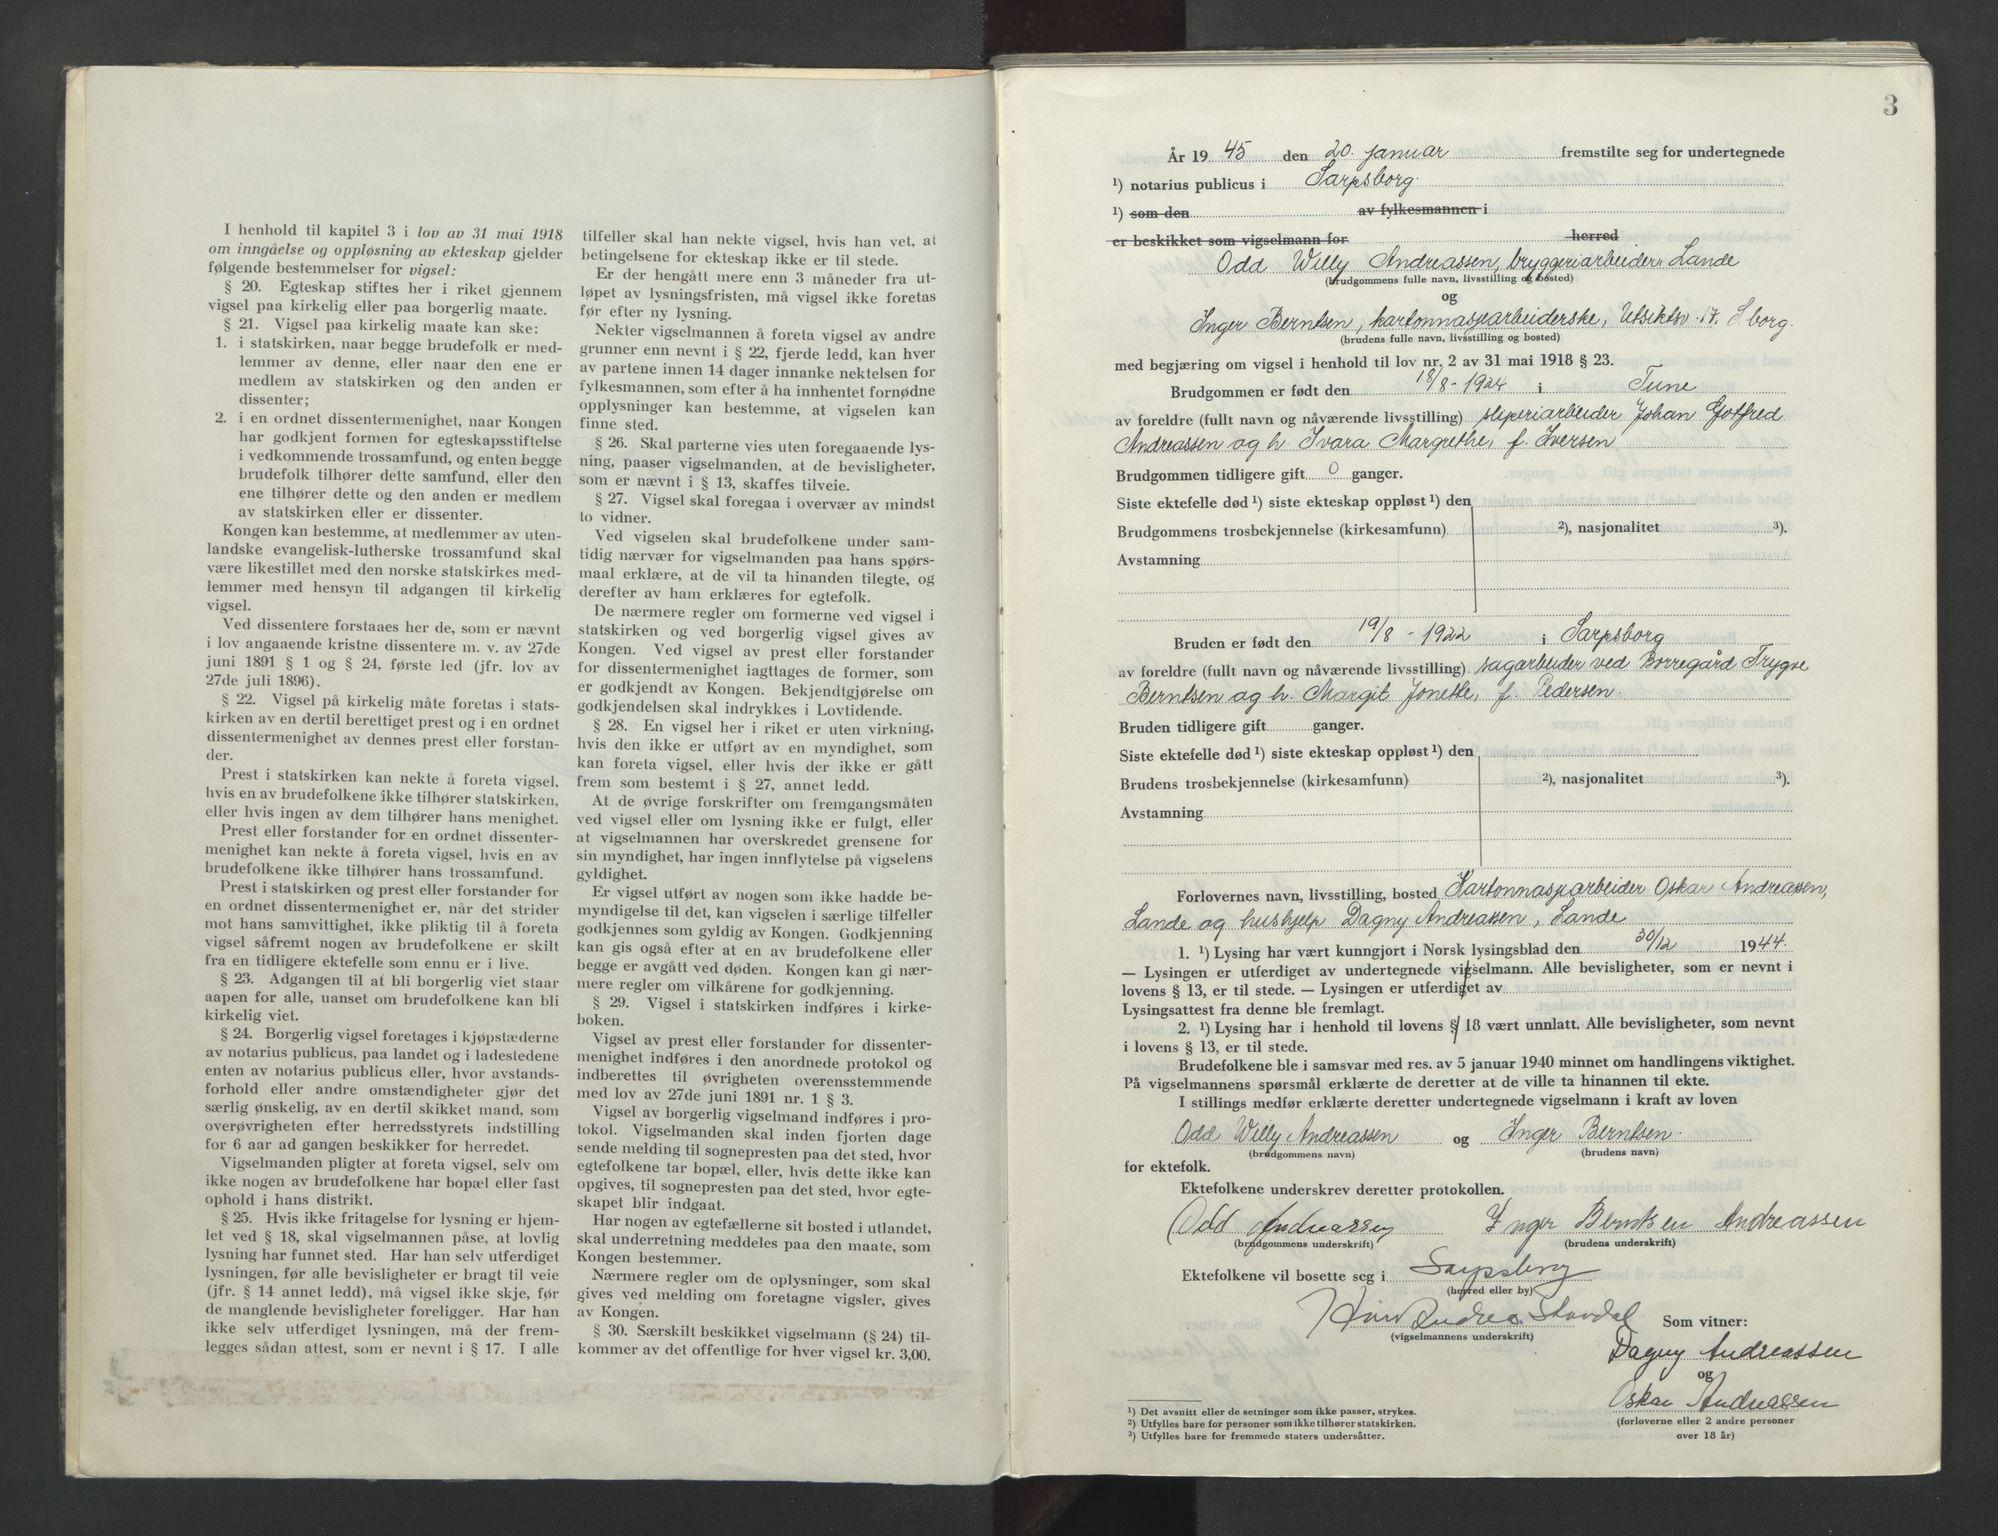 SAO, Sarpsborg byfogd, L/Lb/Lba/L0004: Vigselbok, 1945-1952, s. 2-3